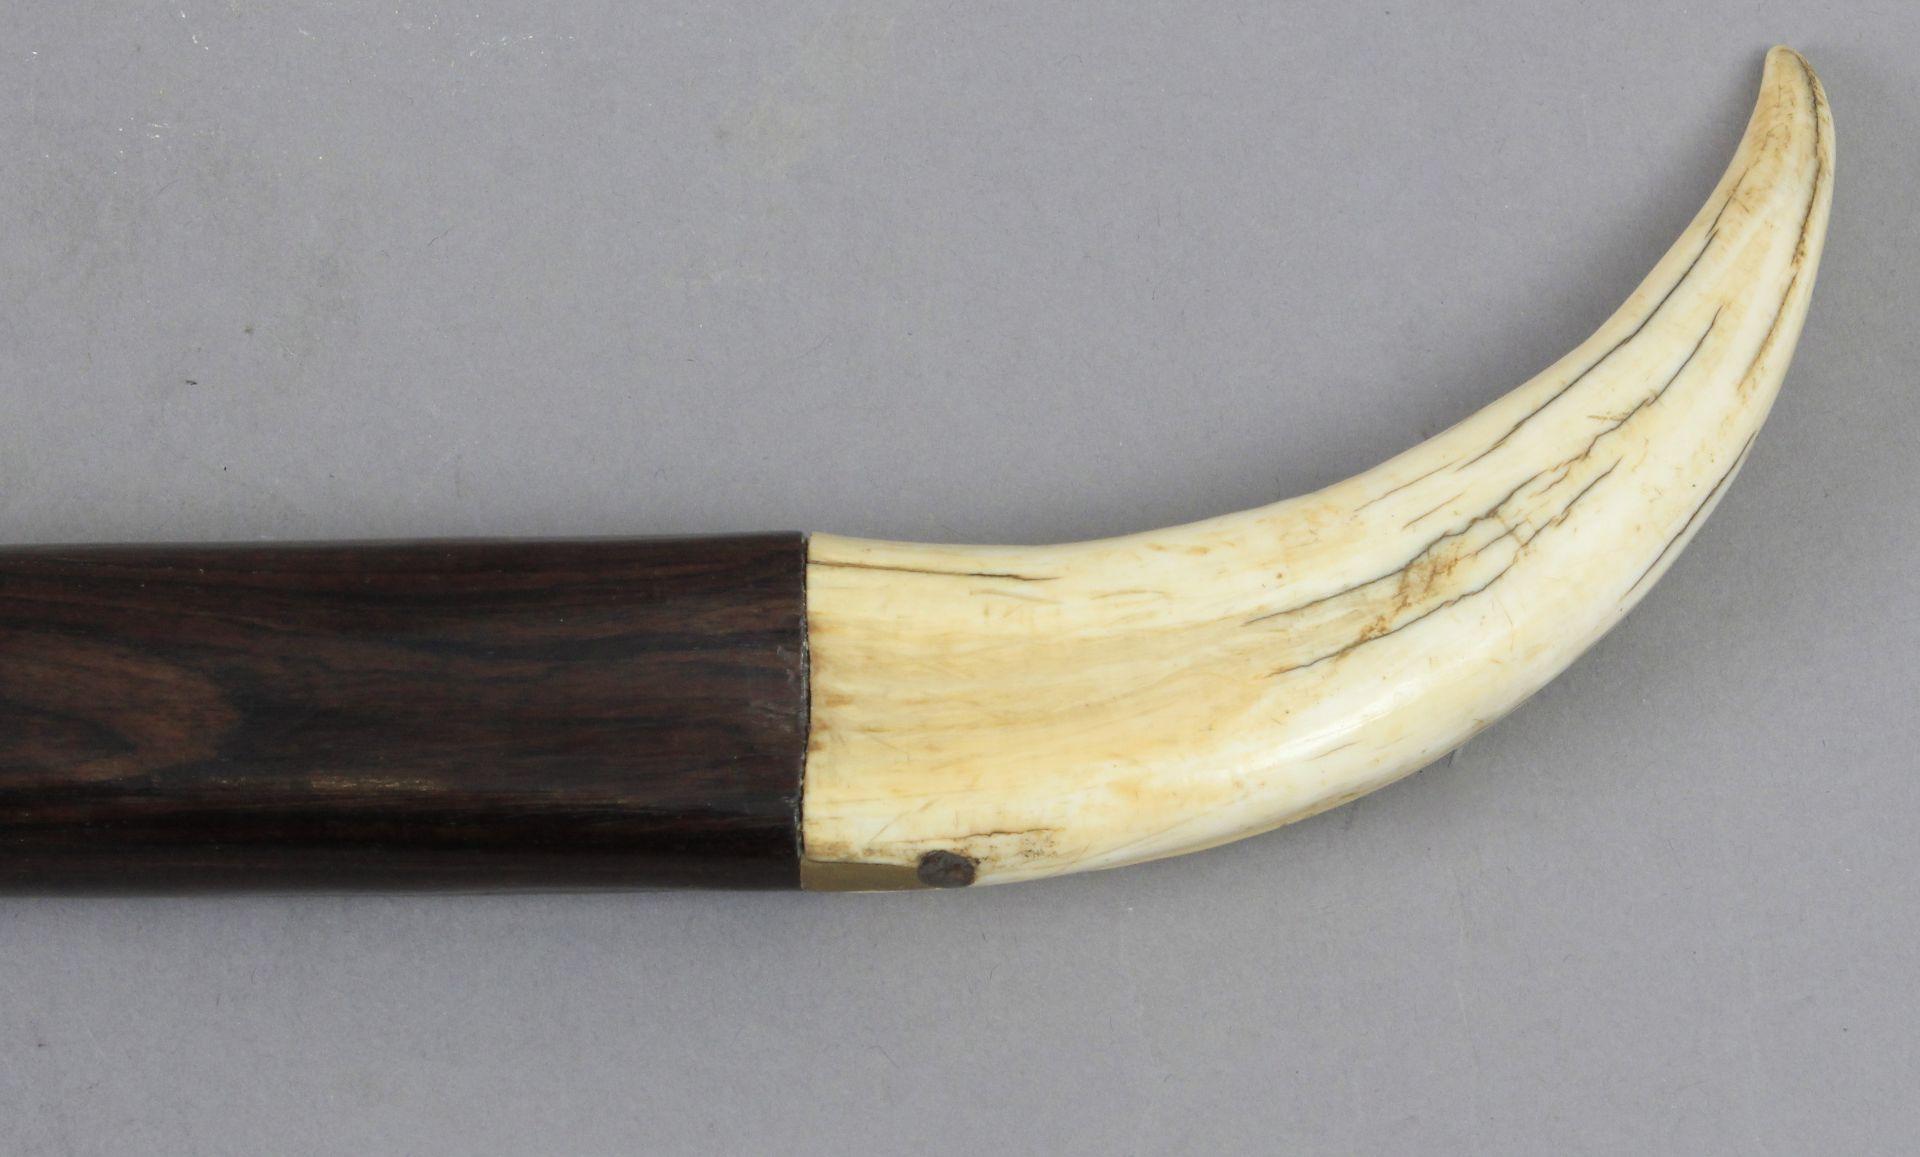 A 19th century walking stick